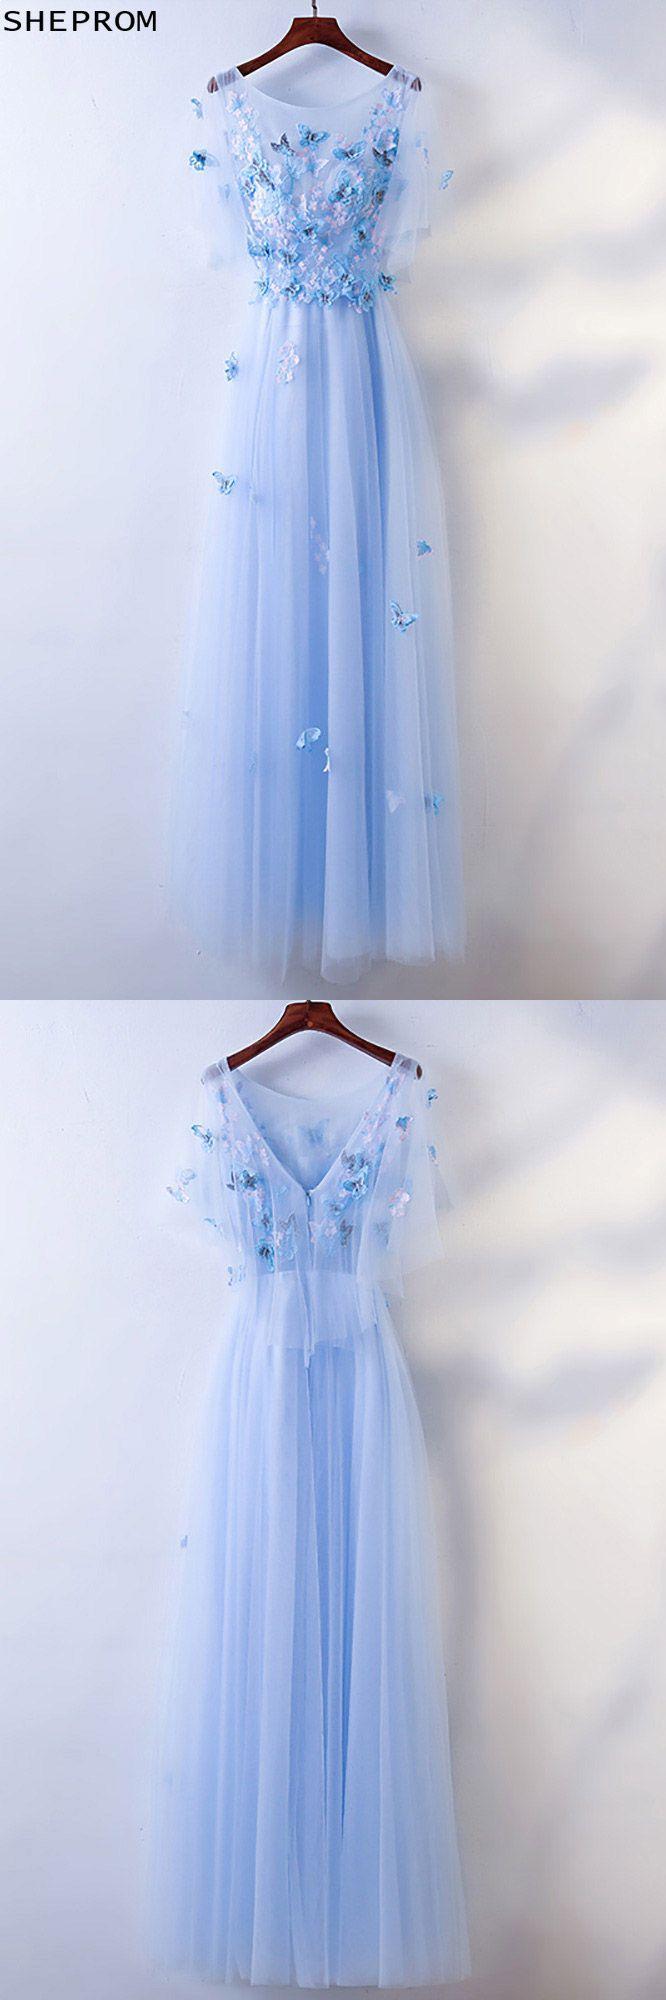 Cute blue flowy long cheap prom dress with butterflies